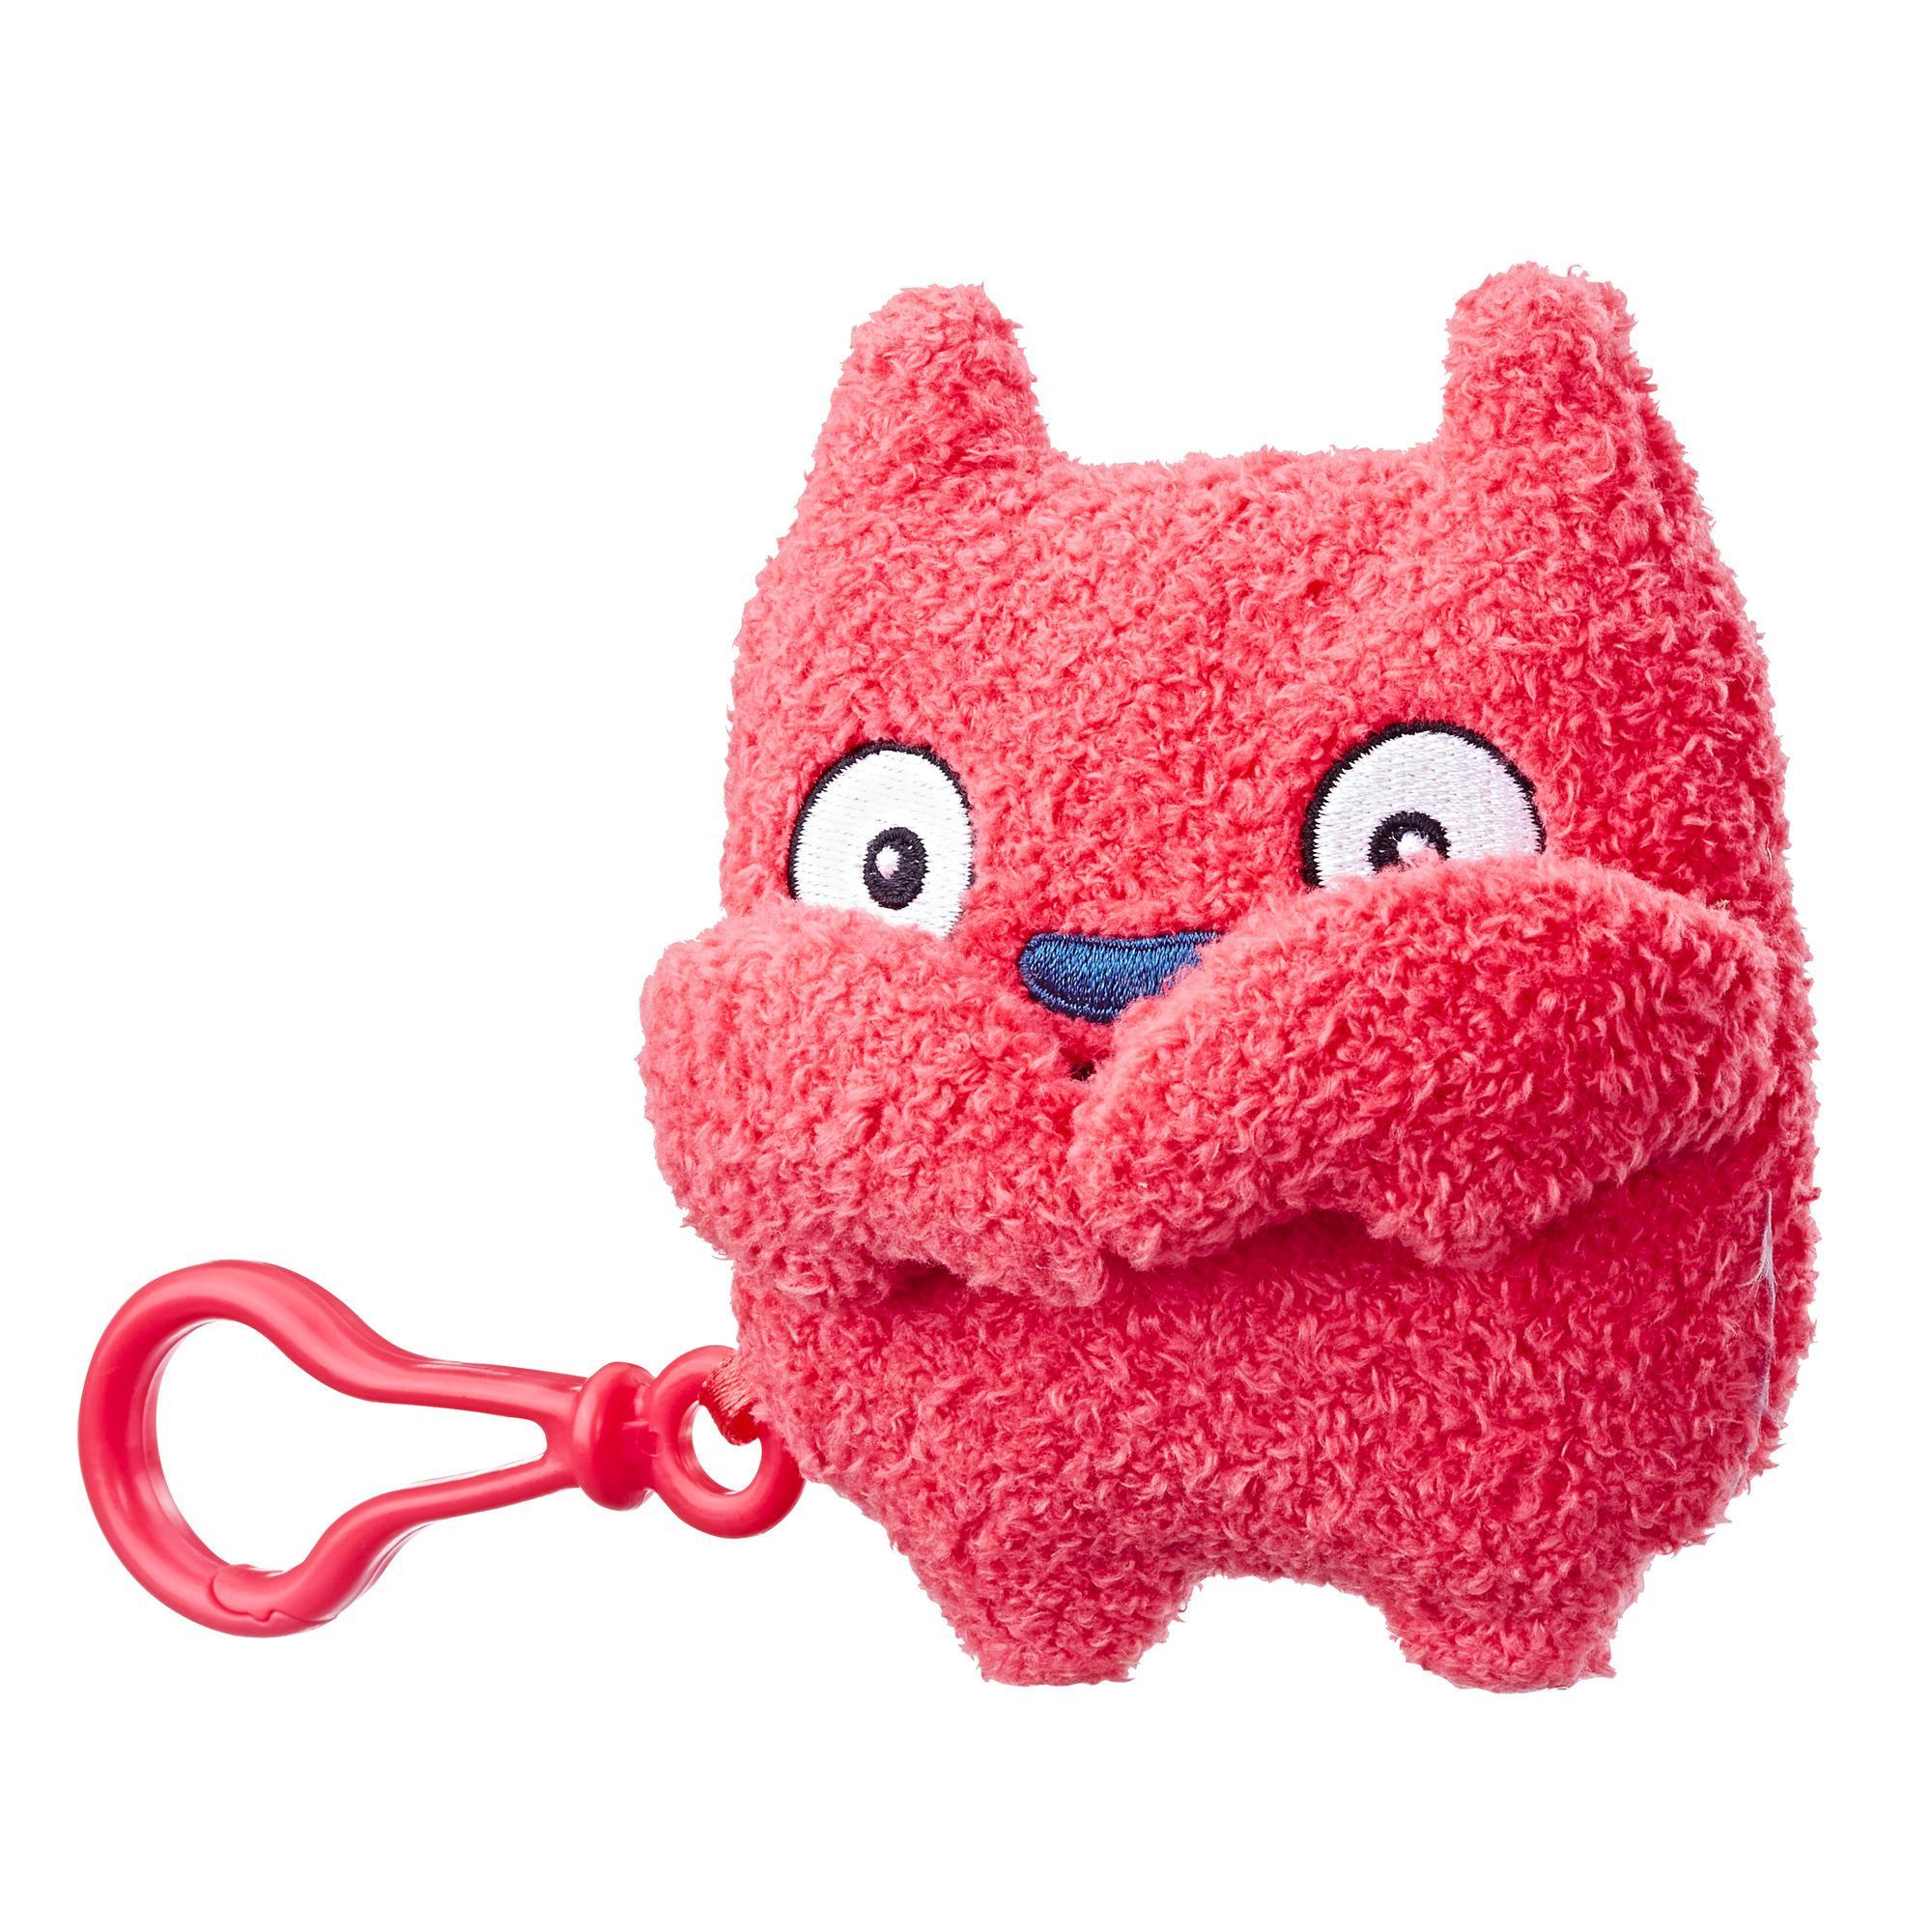 UglyDolls Lucky Bat para llevar - Juguete de peluche, 12,5 cm de alto